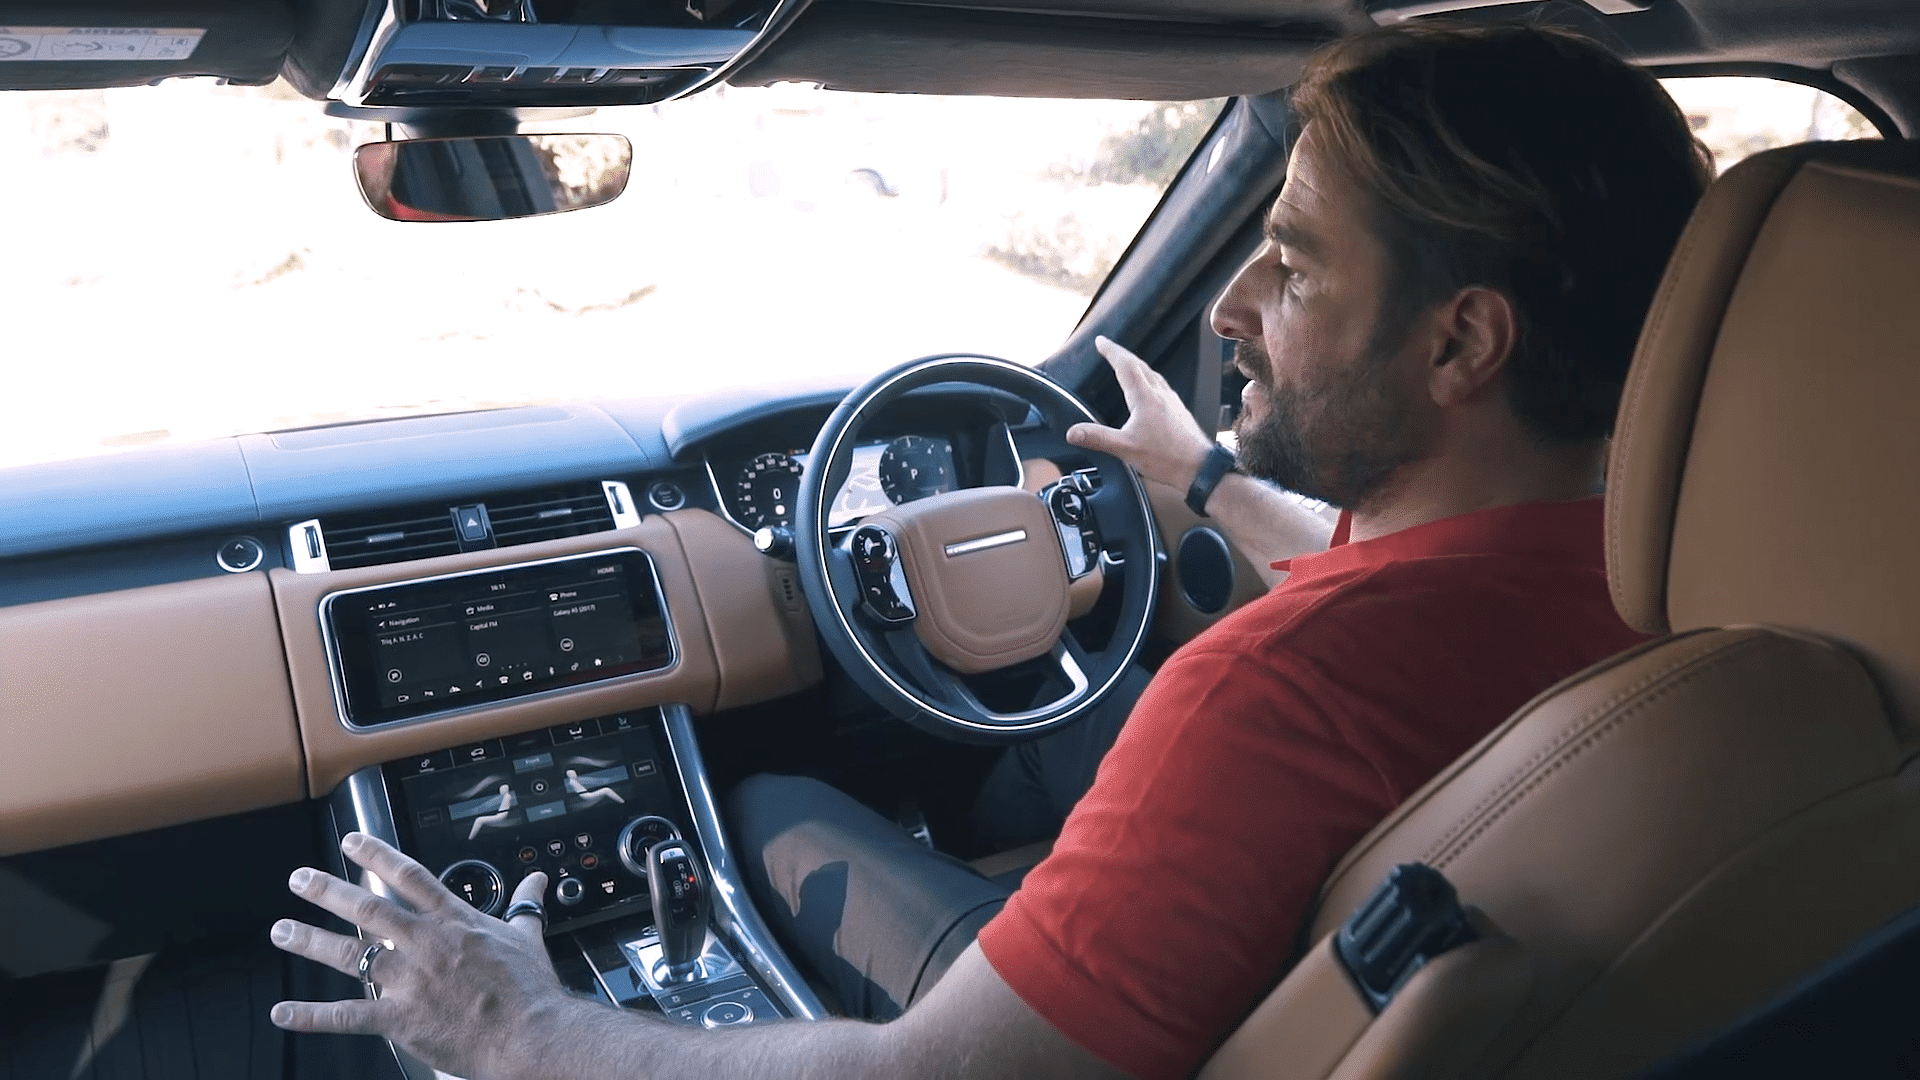 Ian showing off the Range Rovers dashboard